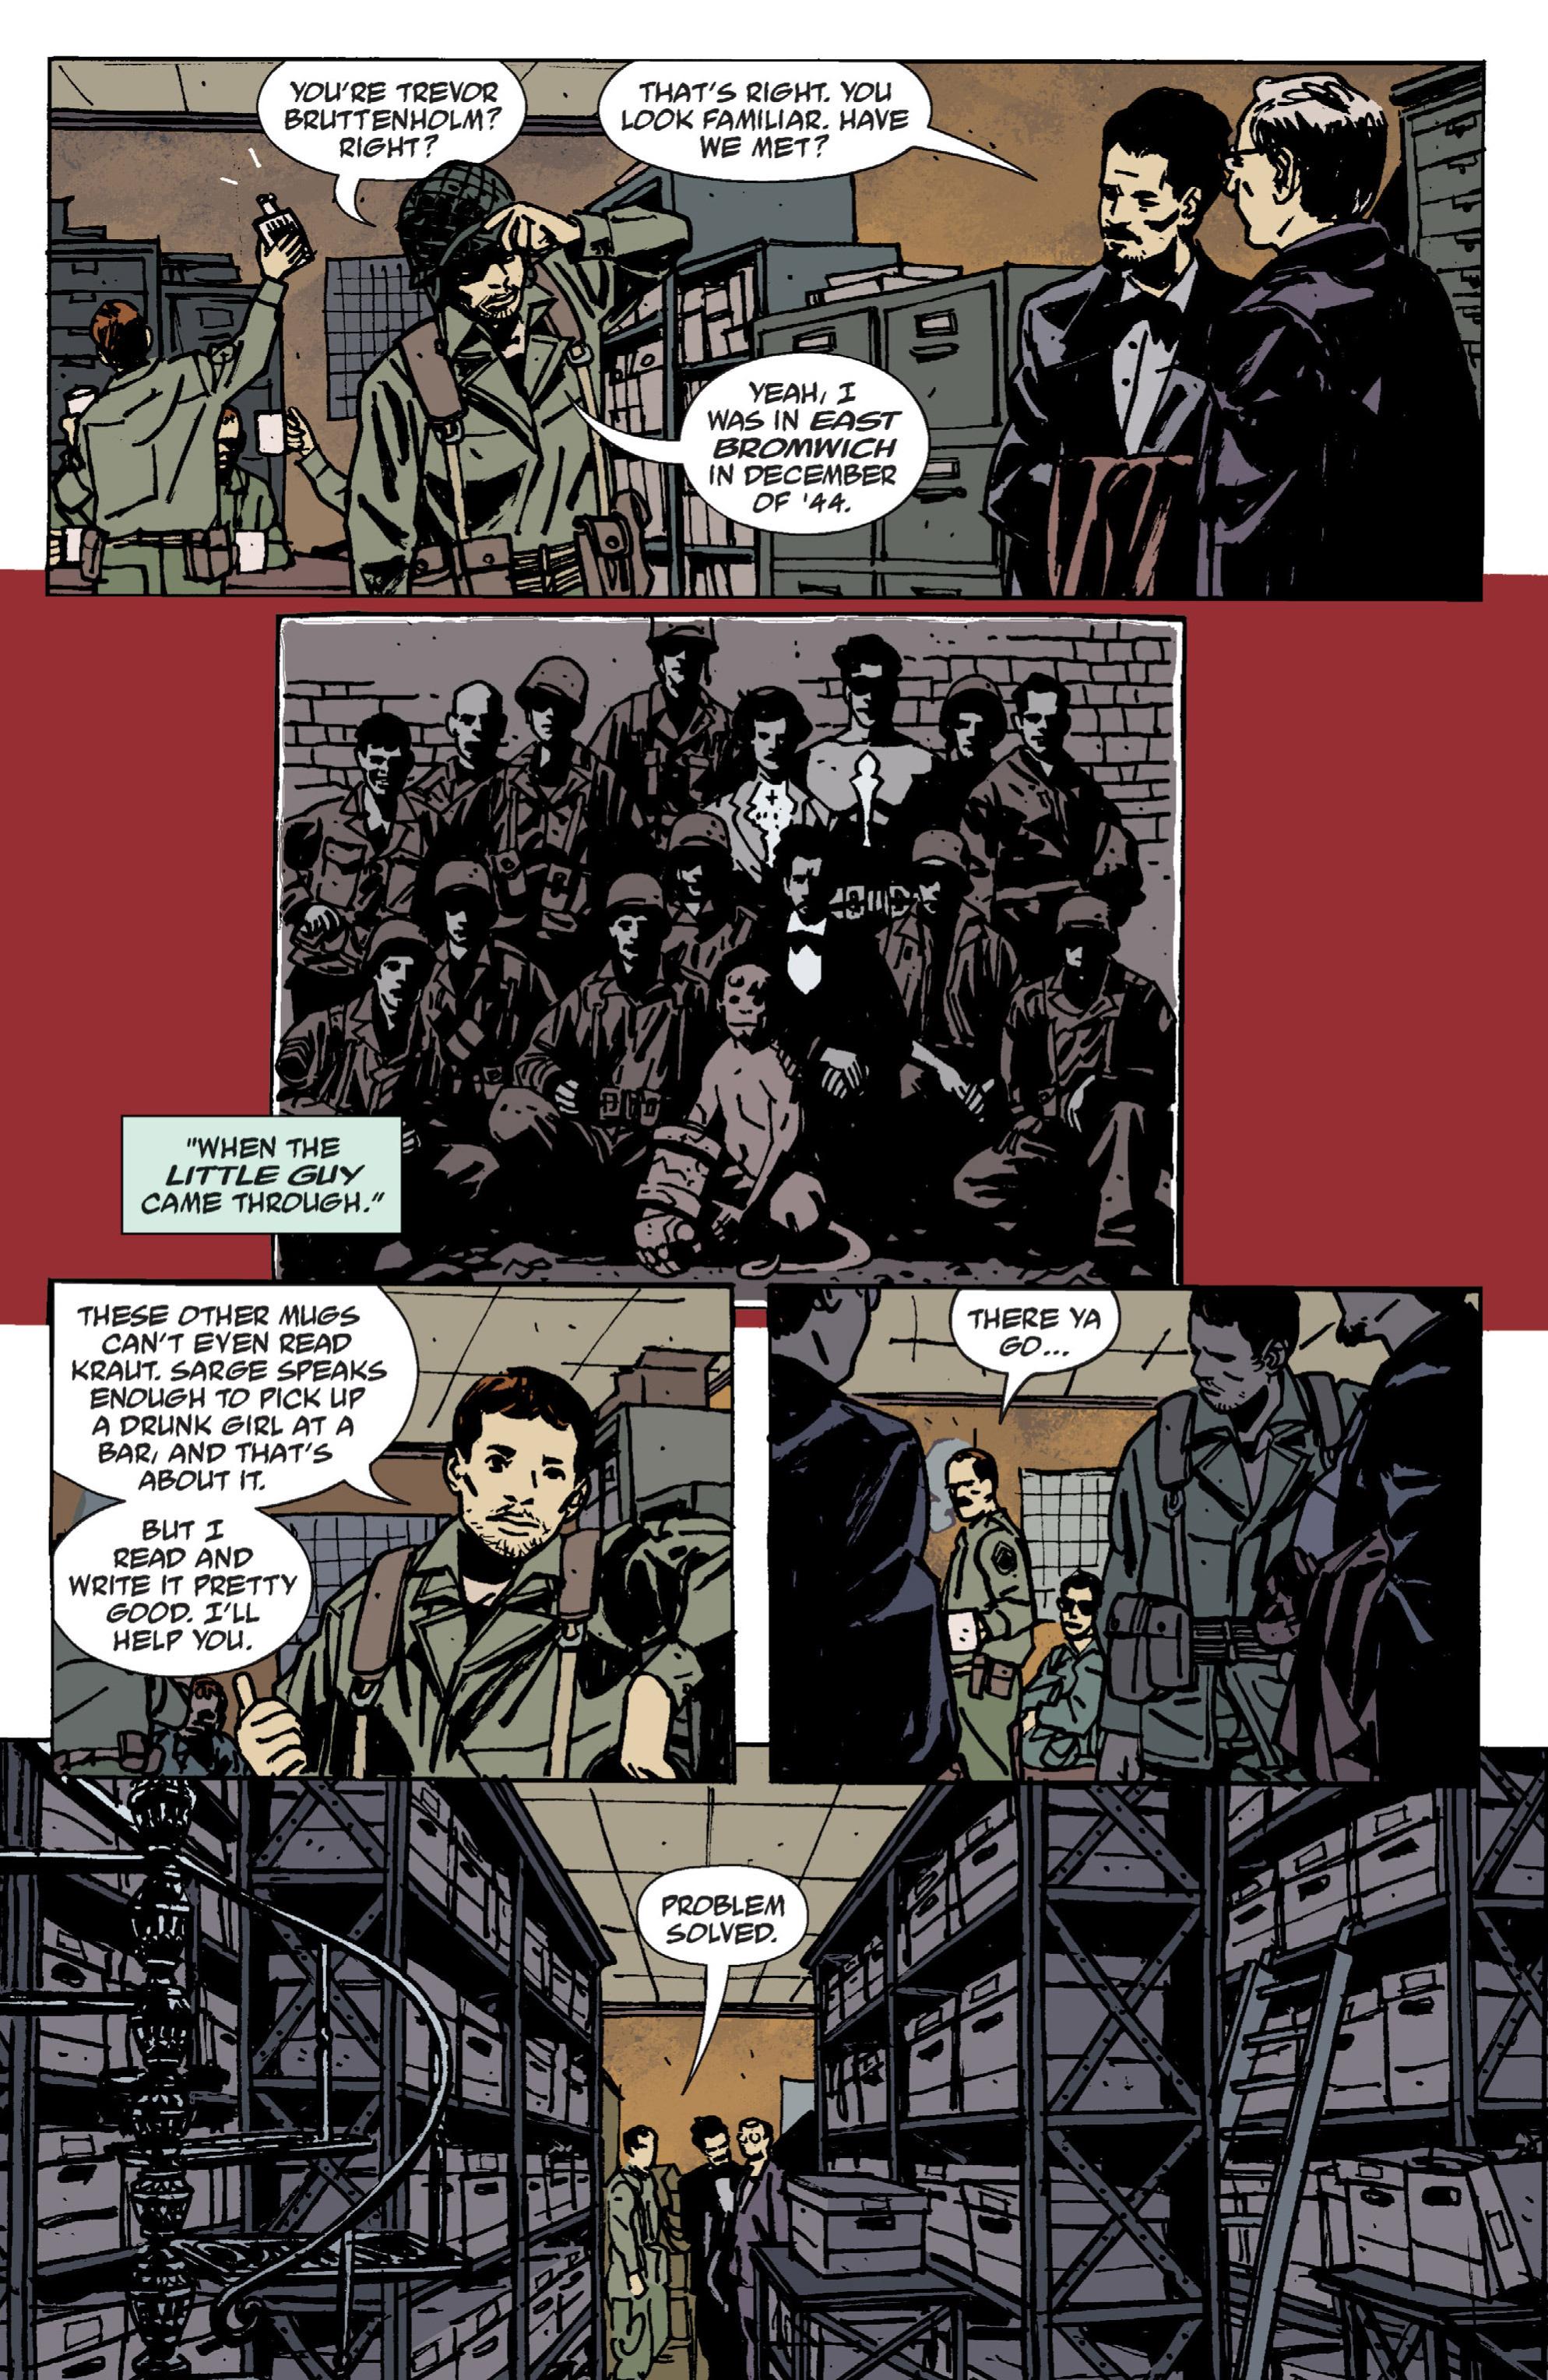 Read online B.P.R.D. (2003) comic -  Issue # TPB 9 - 20